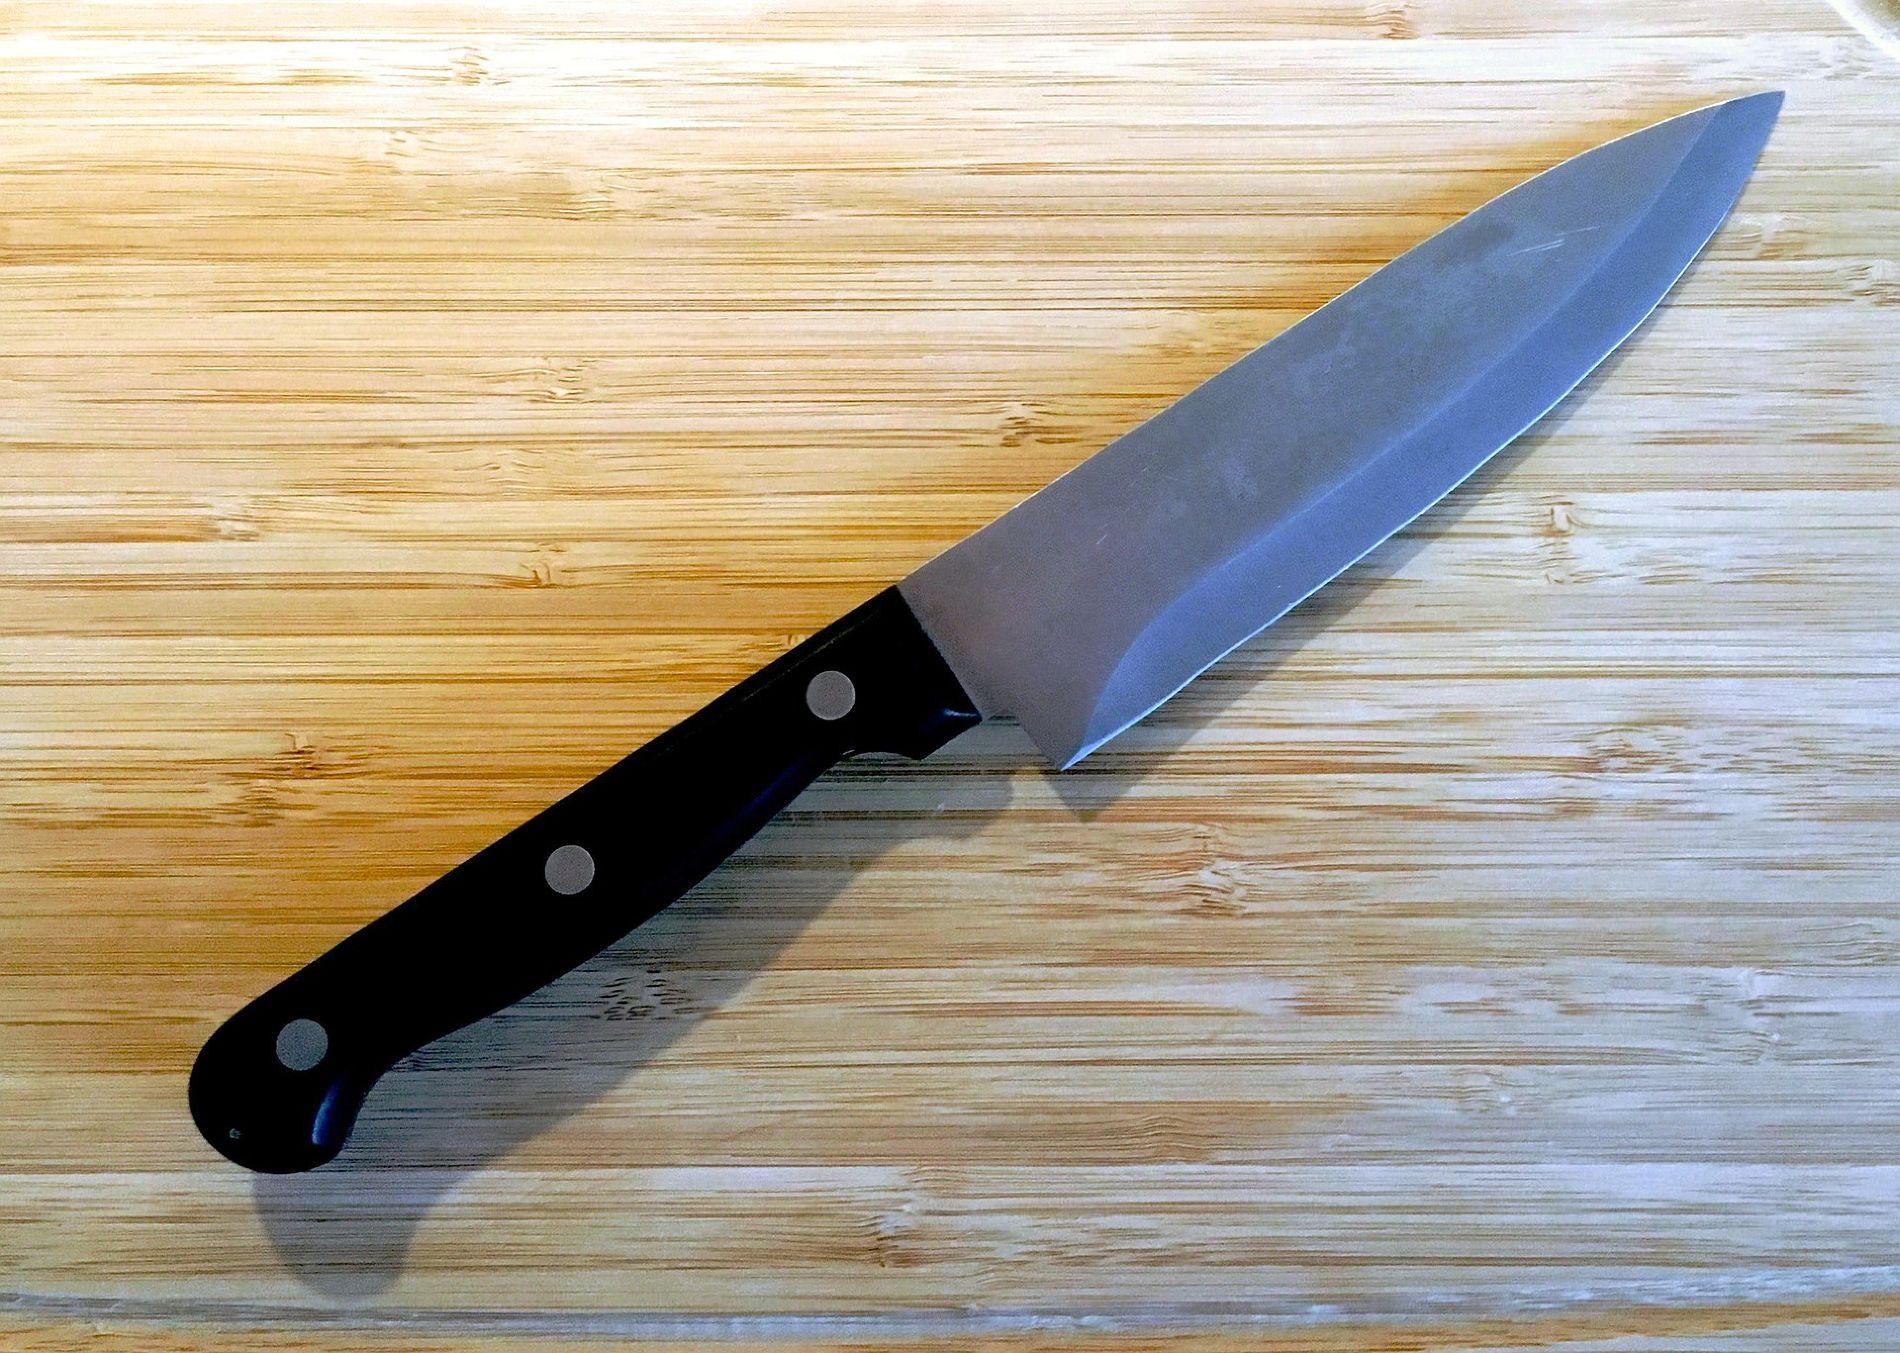 Краснодарец пришел наработу кэкс-жене с 2-мя ножами